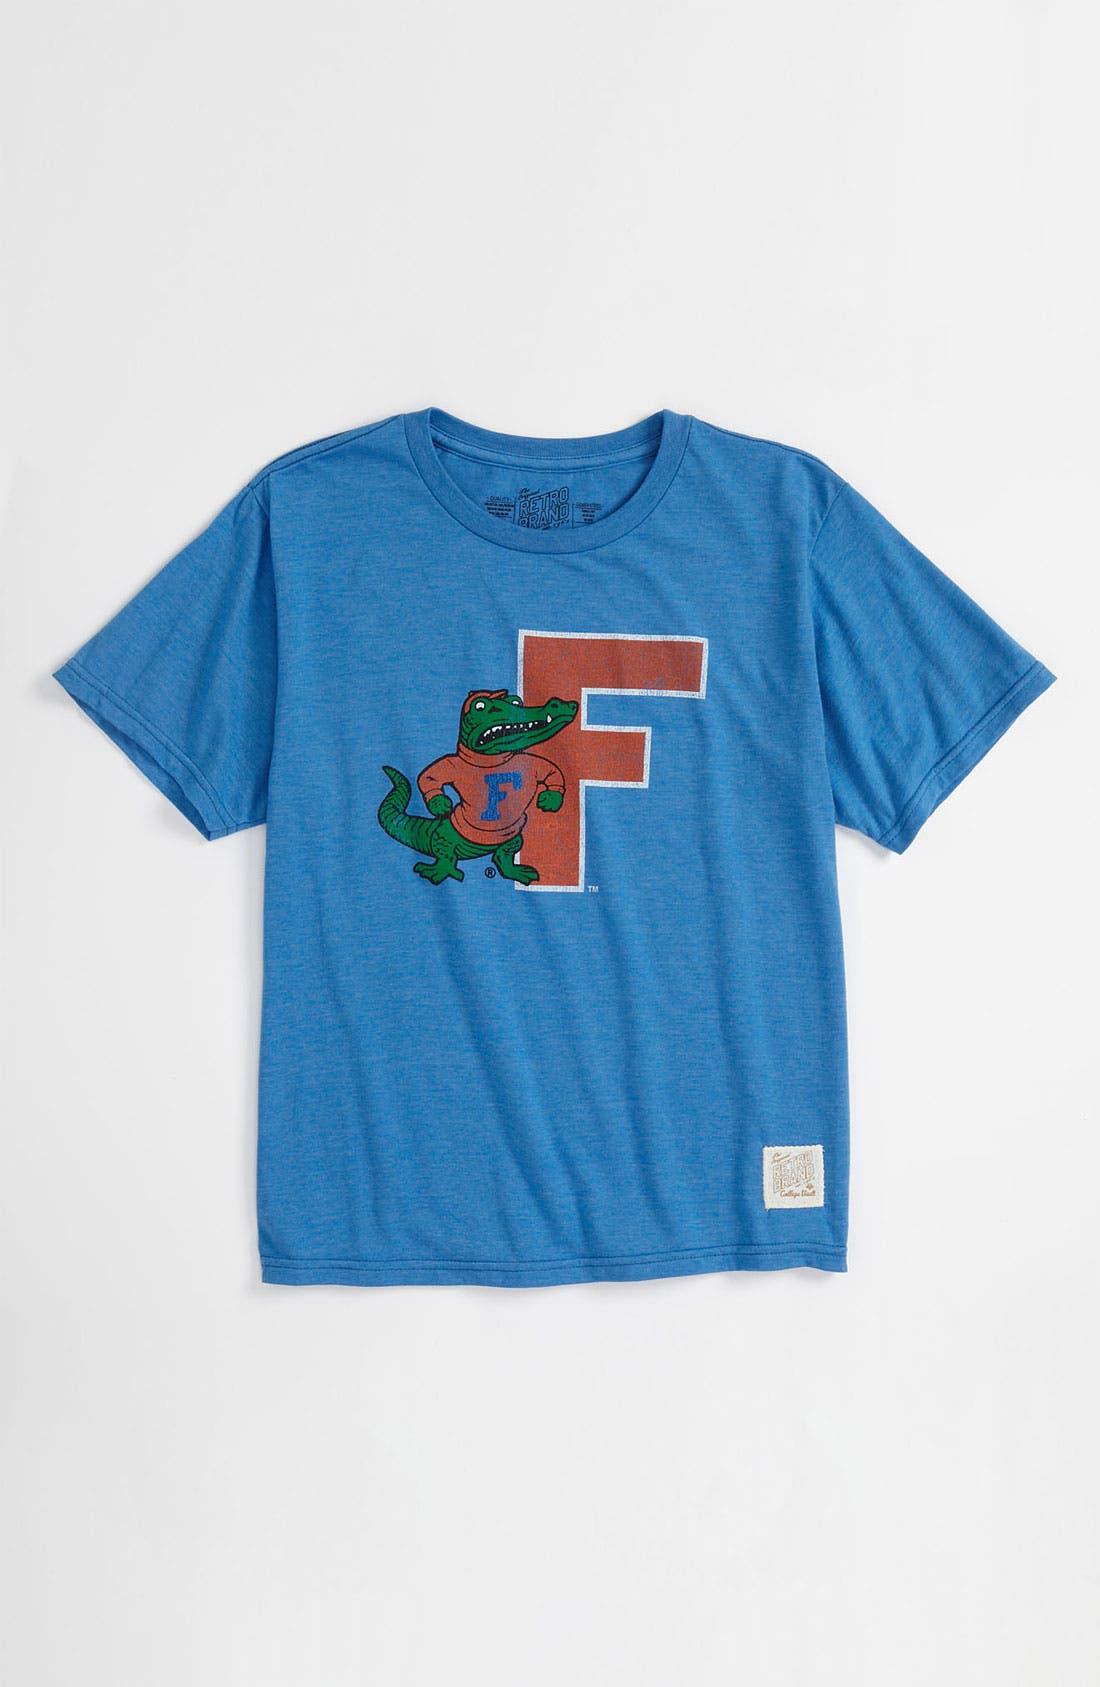 Alternate Image 1 Selected - Retro Brand 'Florida' T-Shirt (Big Boys)